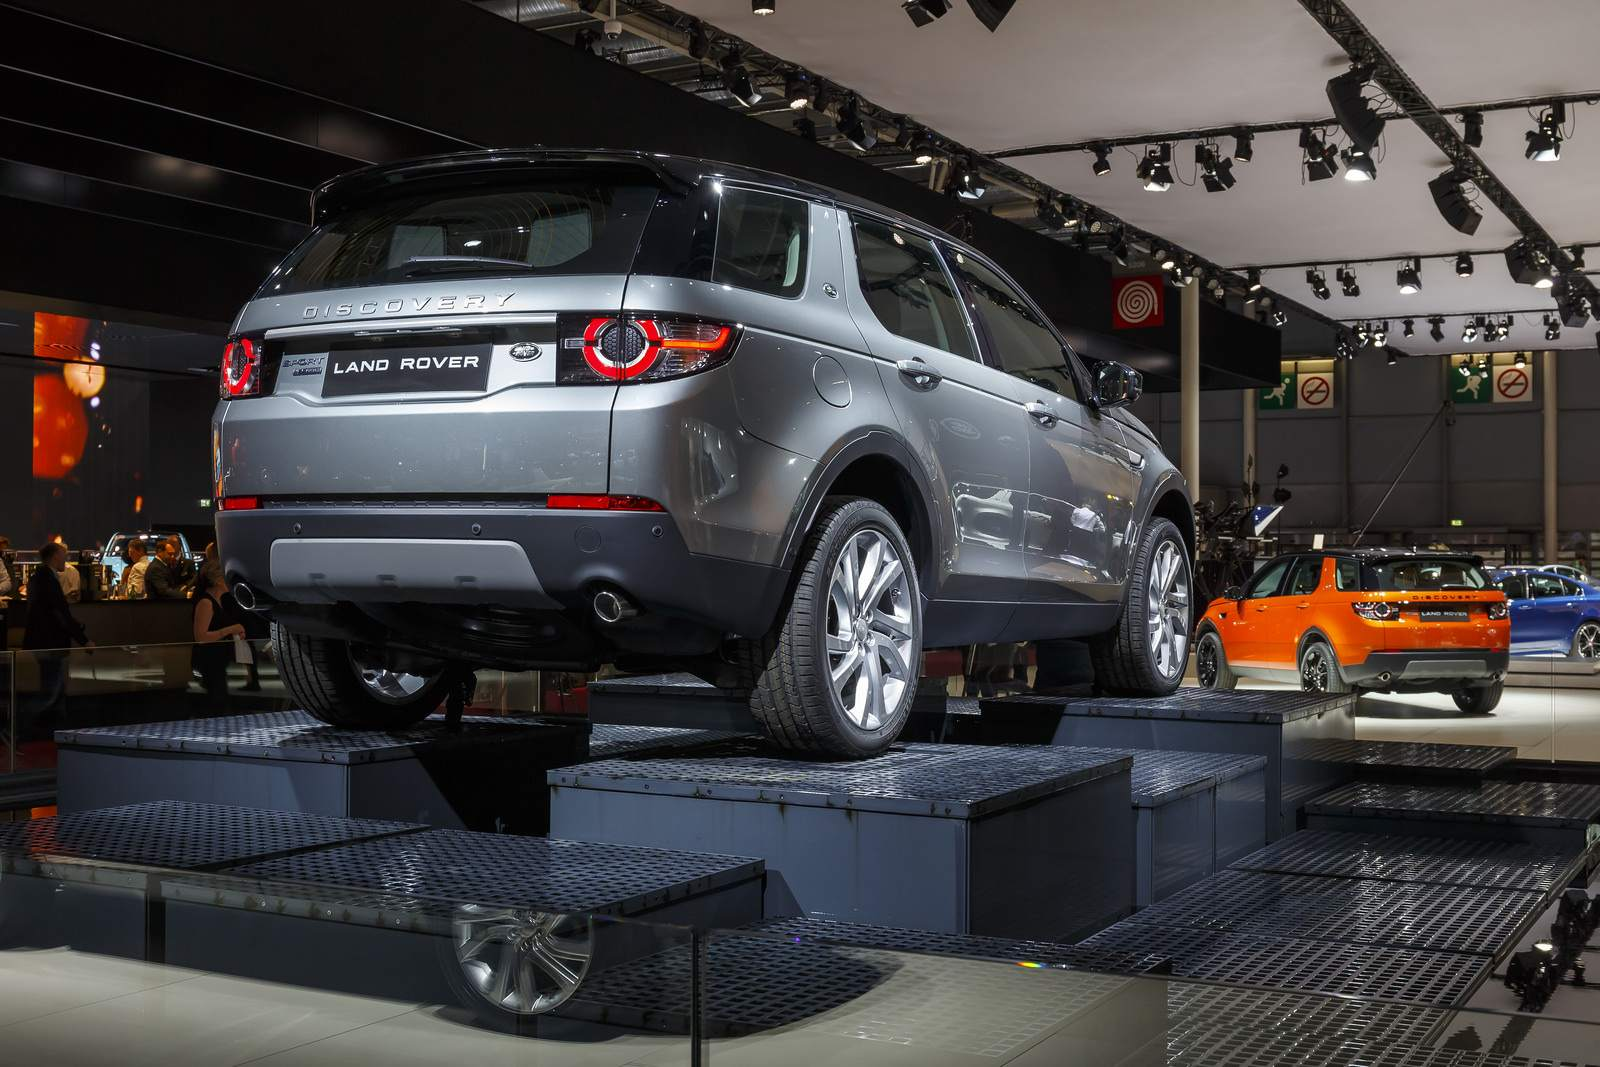 paris motor show2 Jaguar and Land Rover at Paris Auto Show 2014